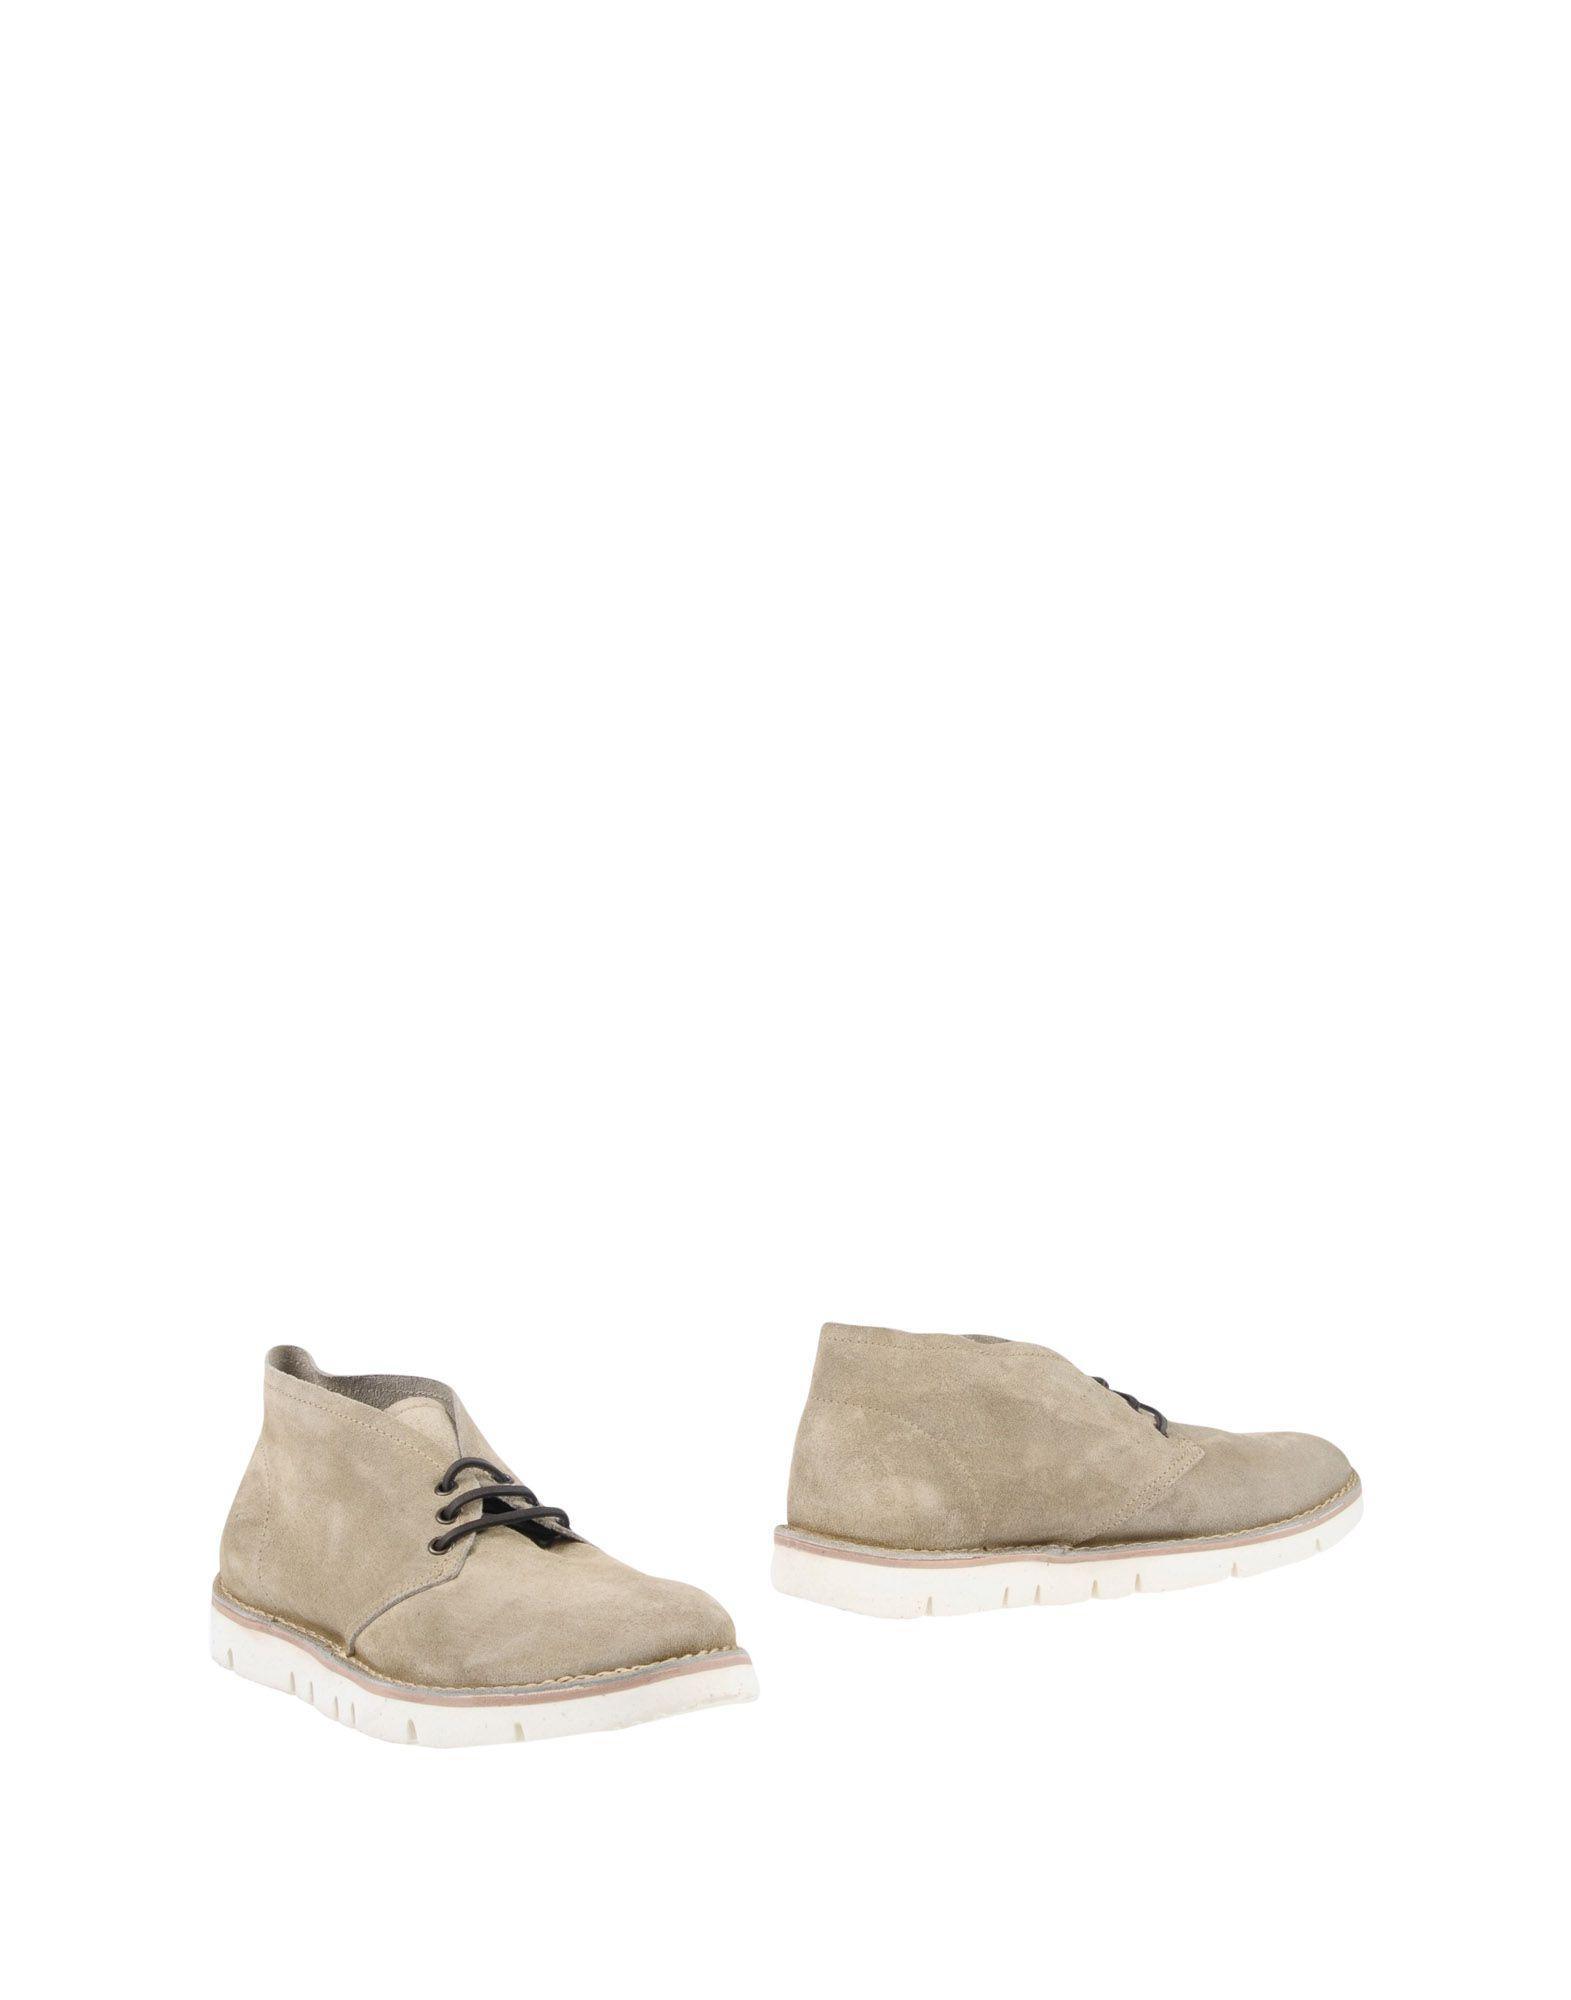 Buttero ® Ankle Boots In Beige